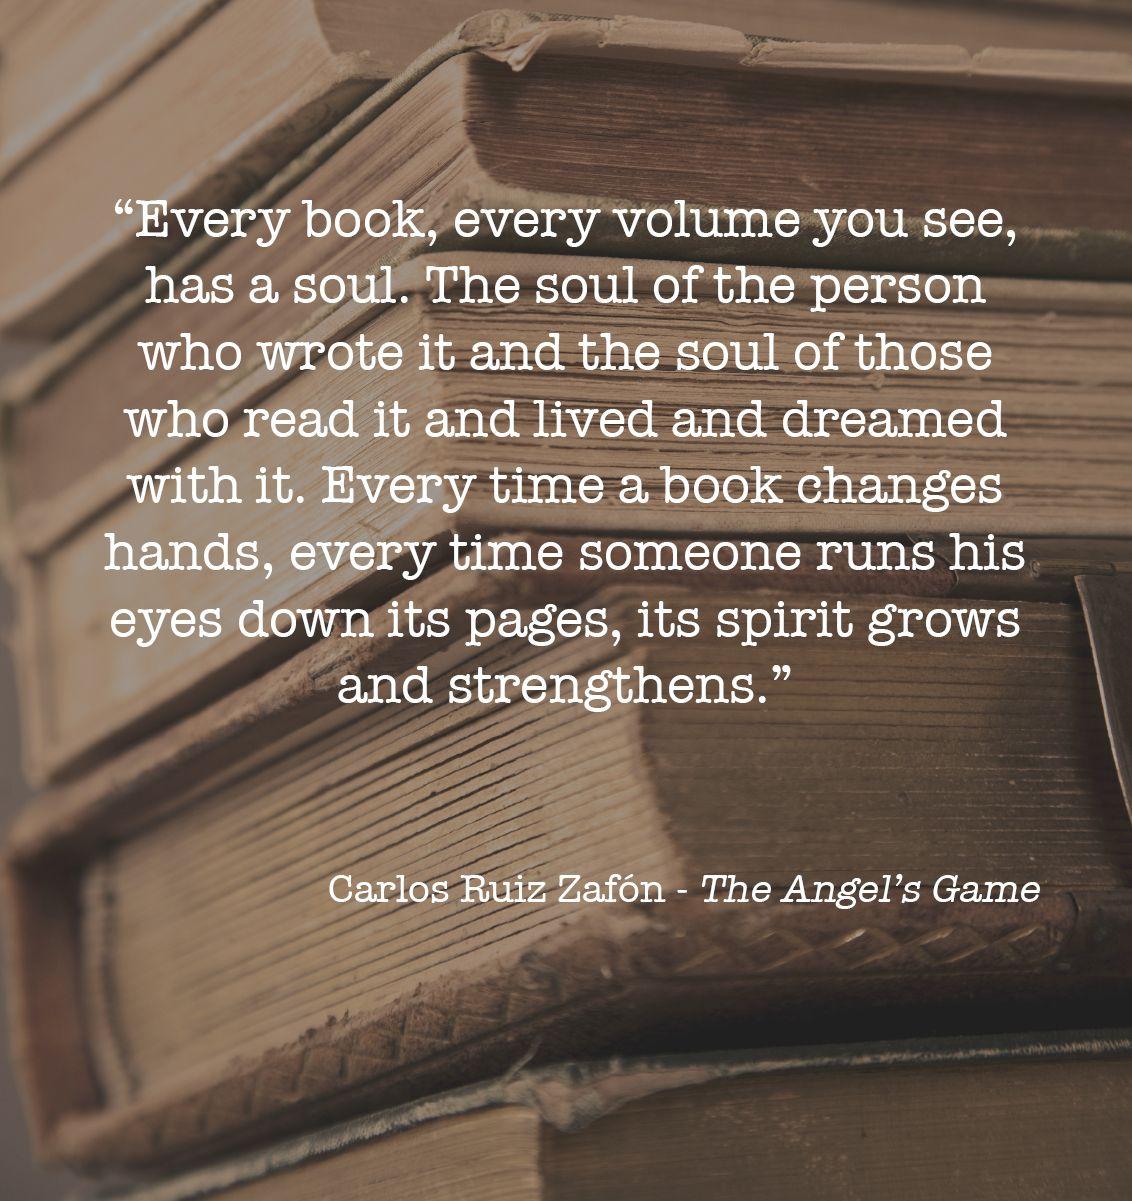 "Every book has a soul."" Carlos Ruiz Zafón - The Angel's Game ..."